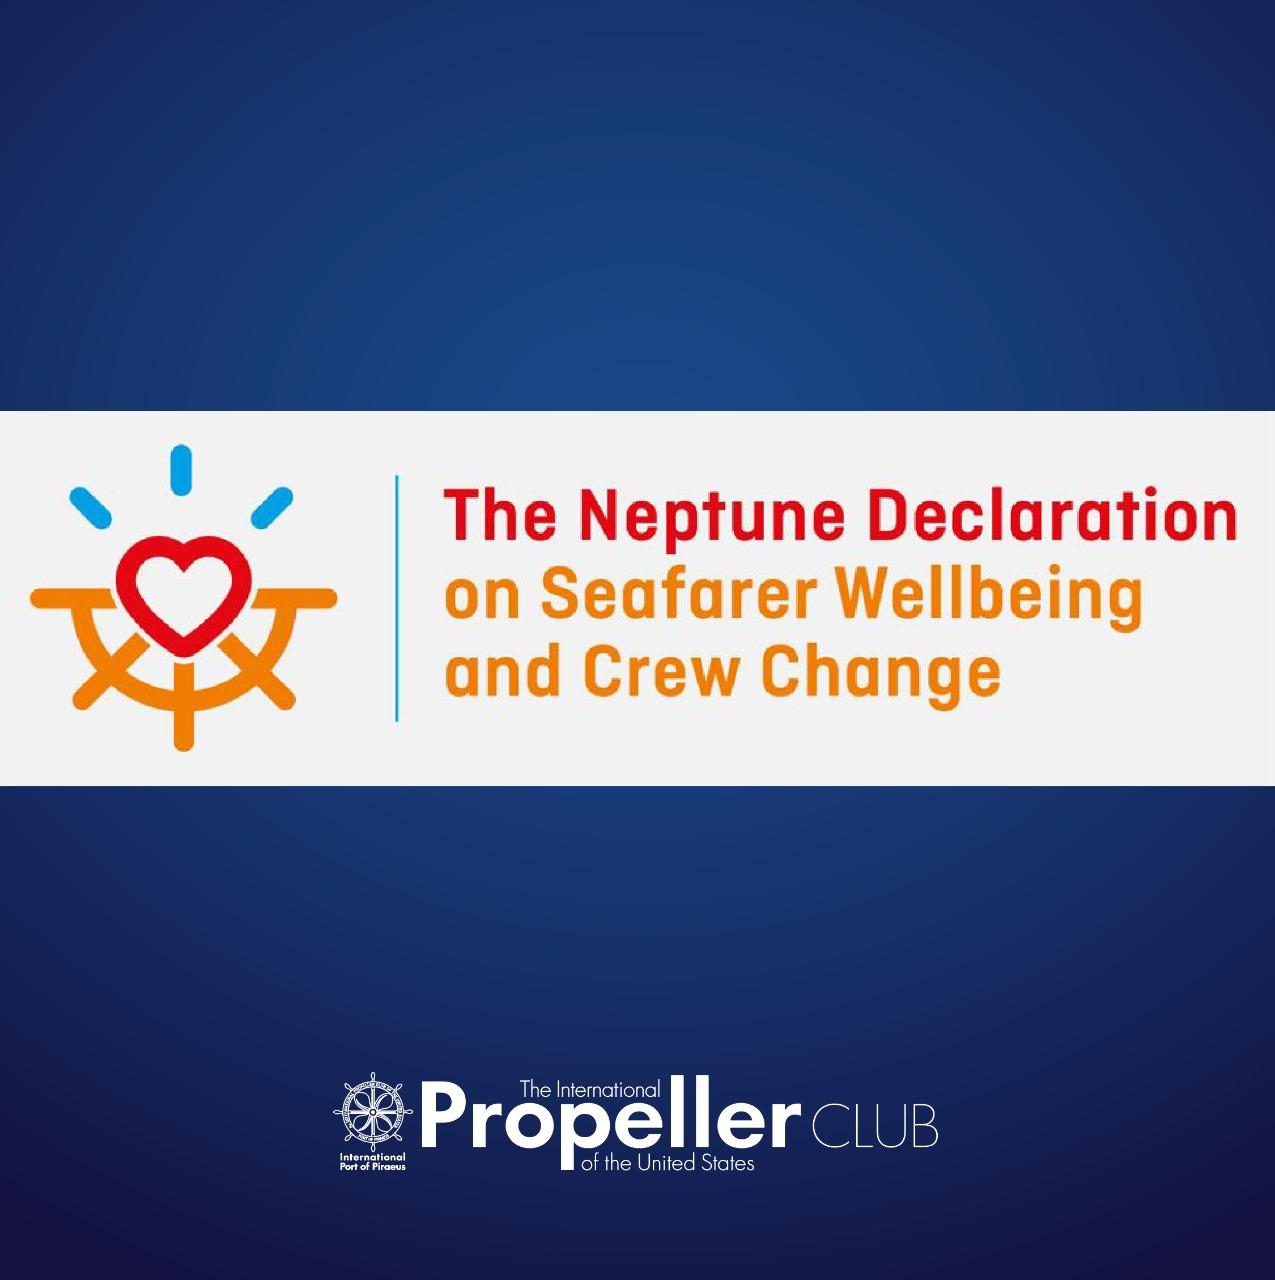 The Neptune Declaration